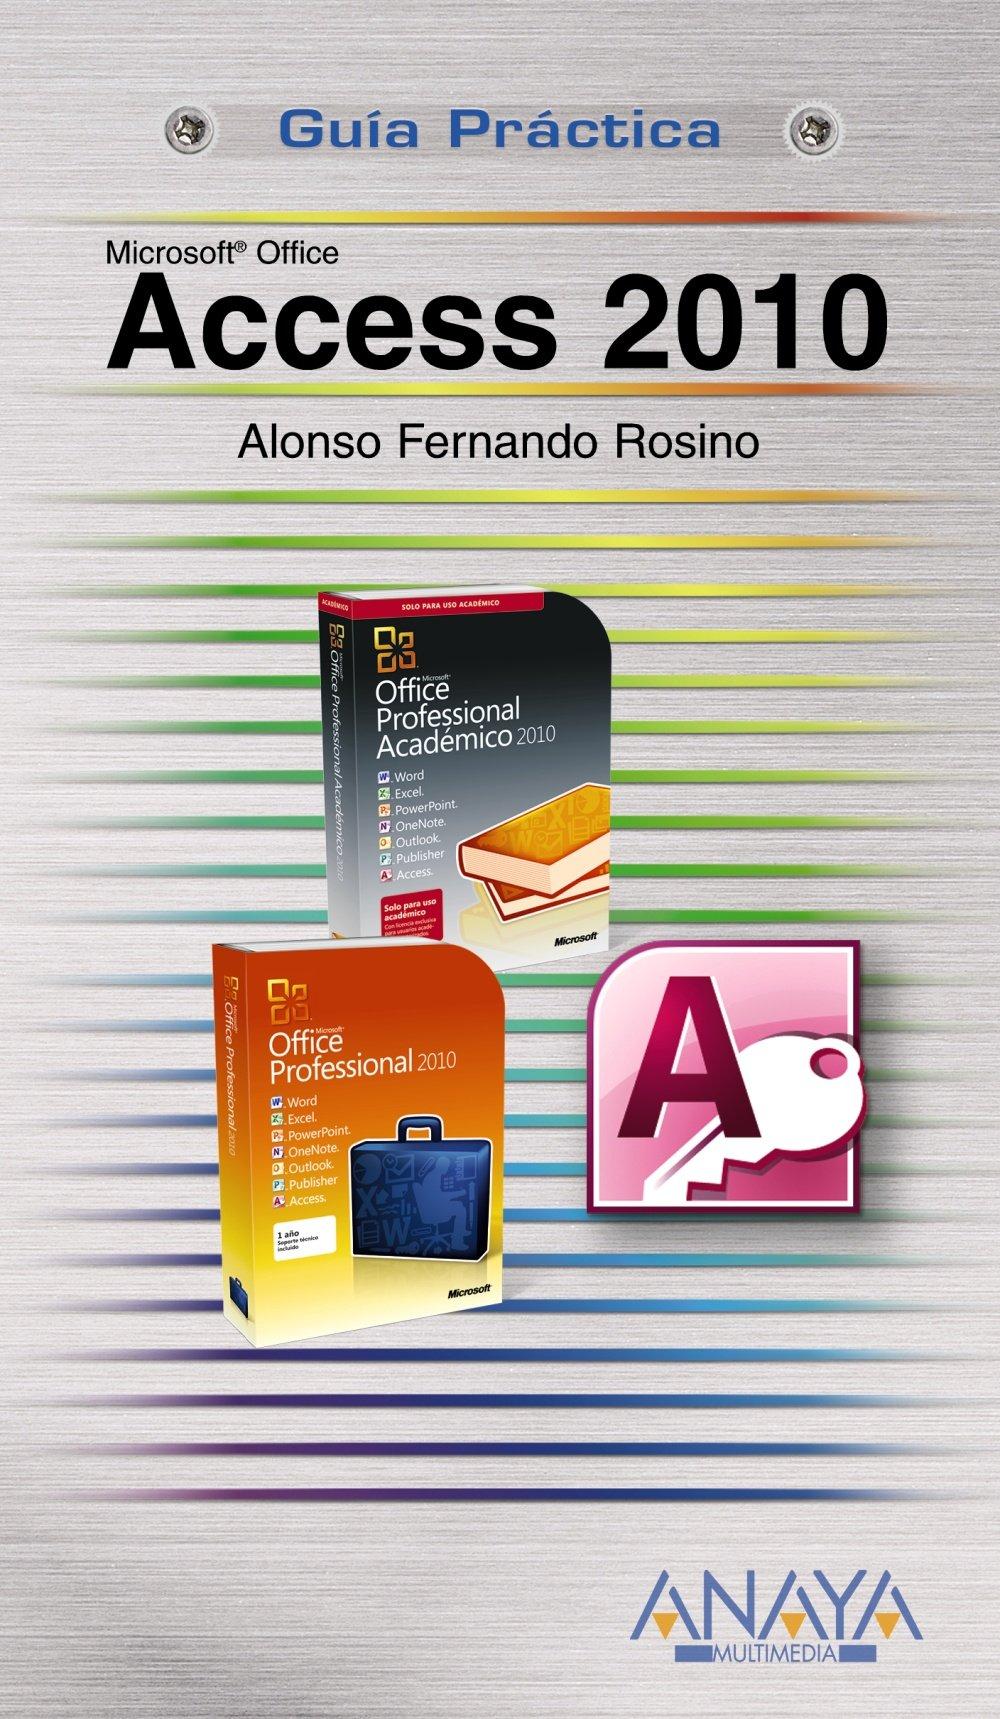 Access 2010 (Guías Prácticas) Tapa blanda – 20 sep 2010 Fernando Rosino Alonso ANAYA MULTIMEDIA 8441527903 General